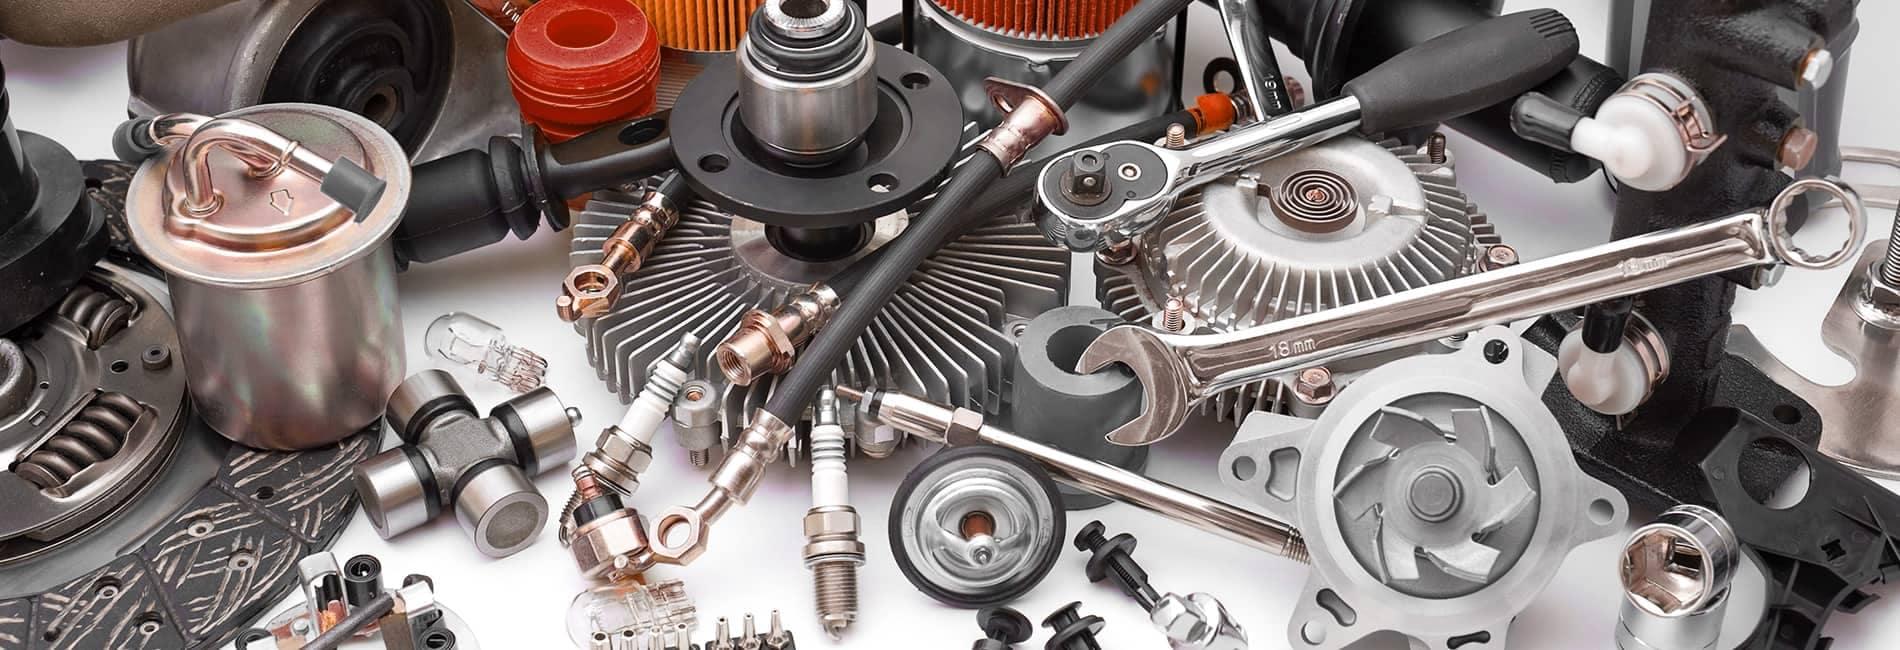 An assortment of parts